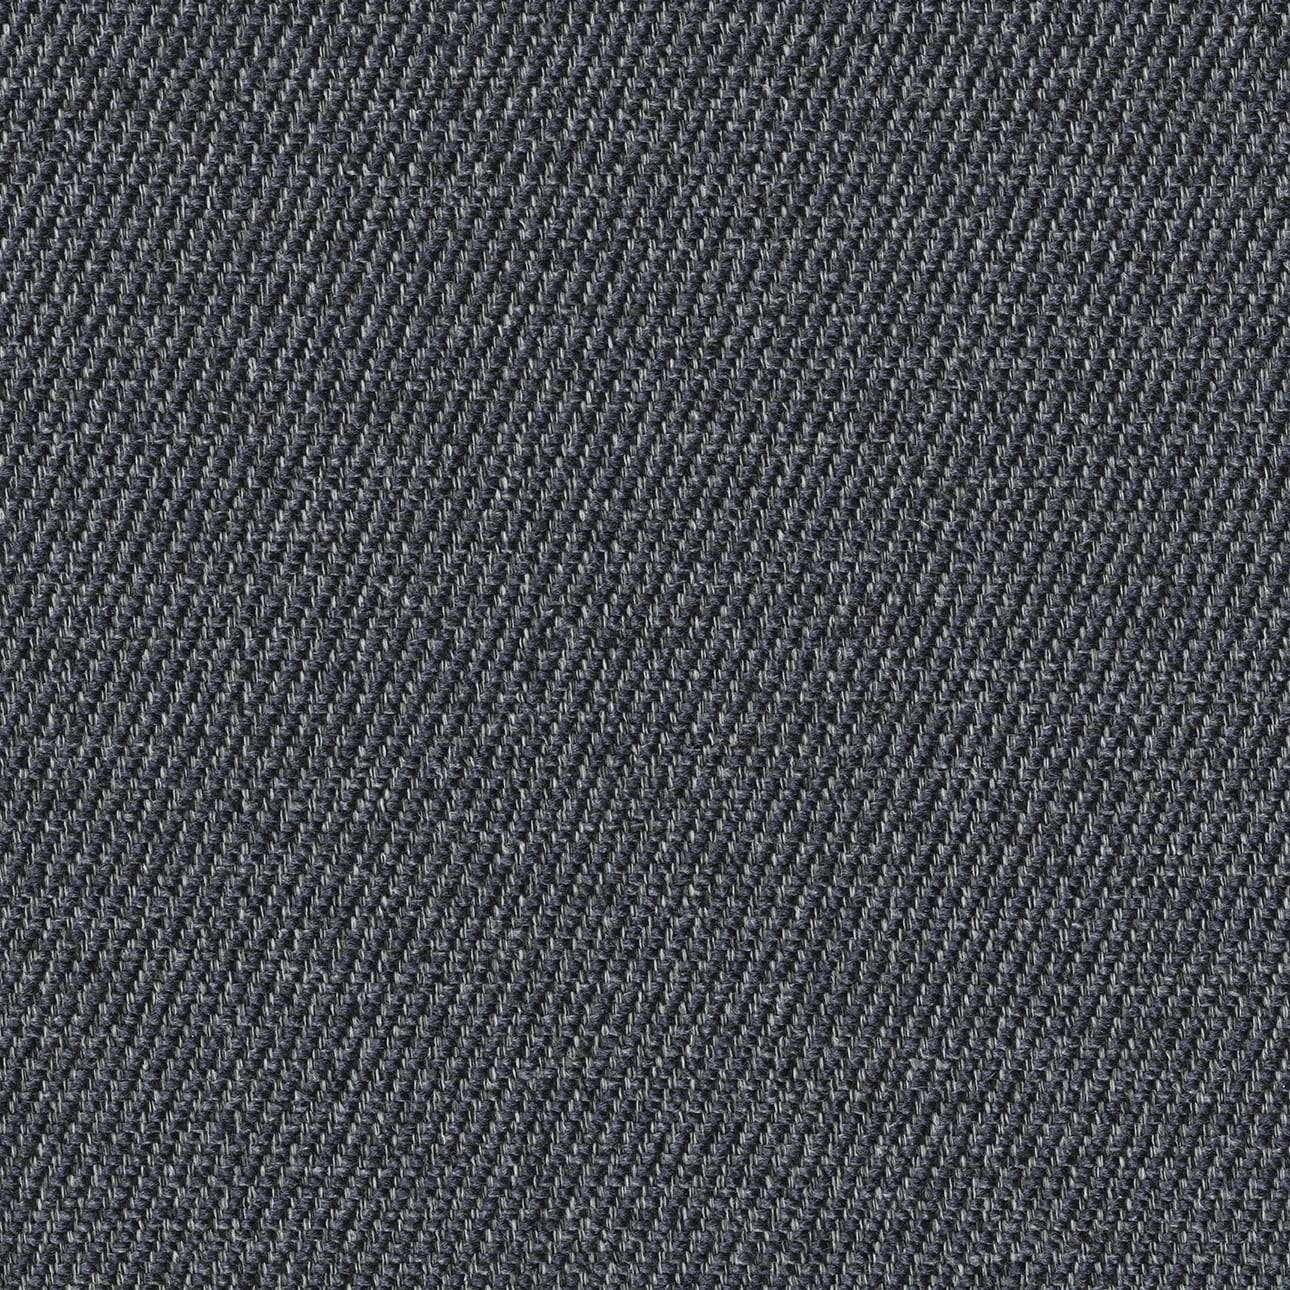 Poszewka na podłokietnik Beddinge w kolekcji Living, tkanina: 160-74